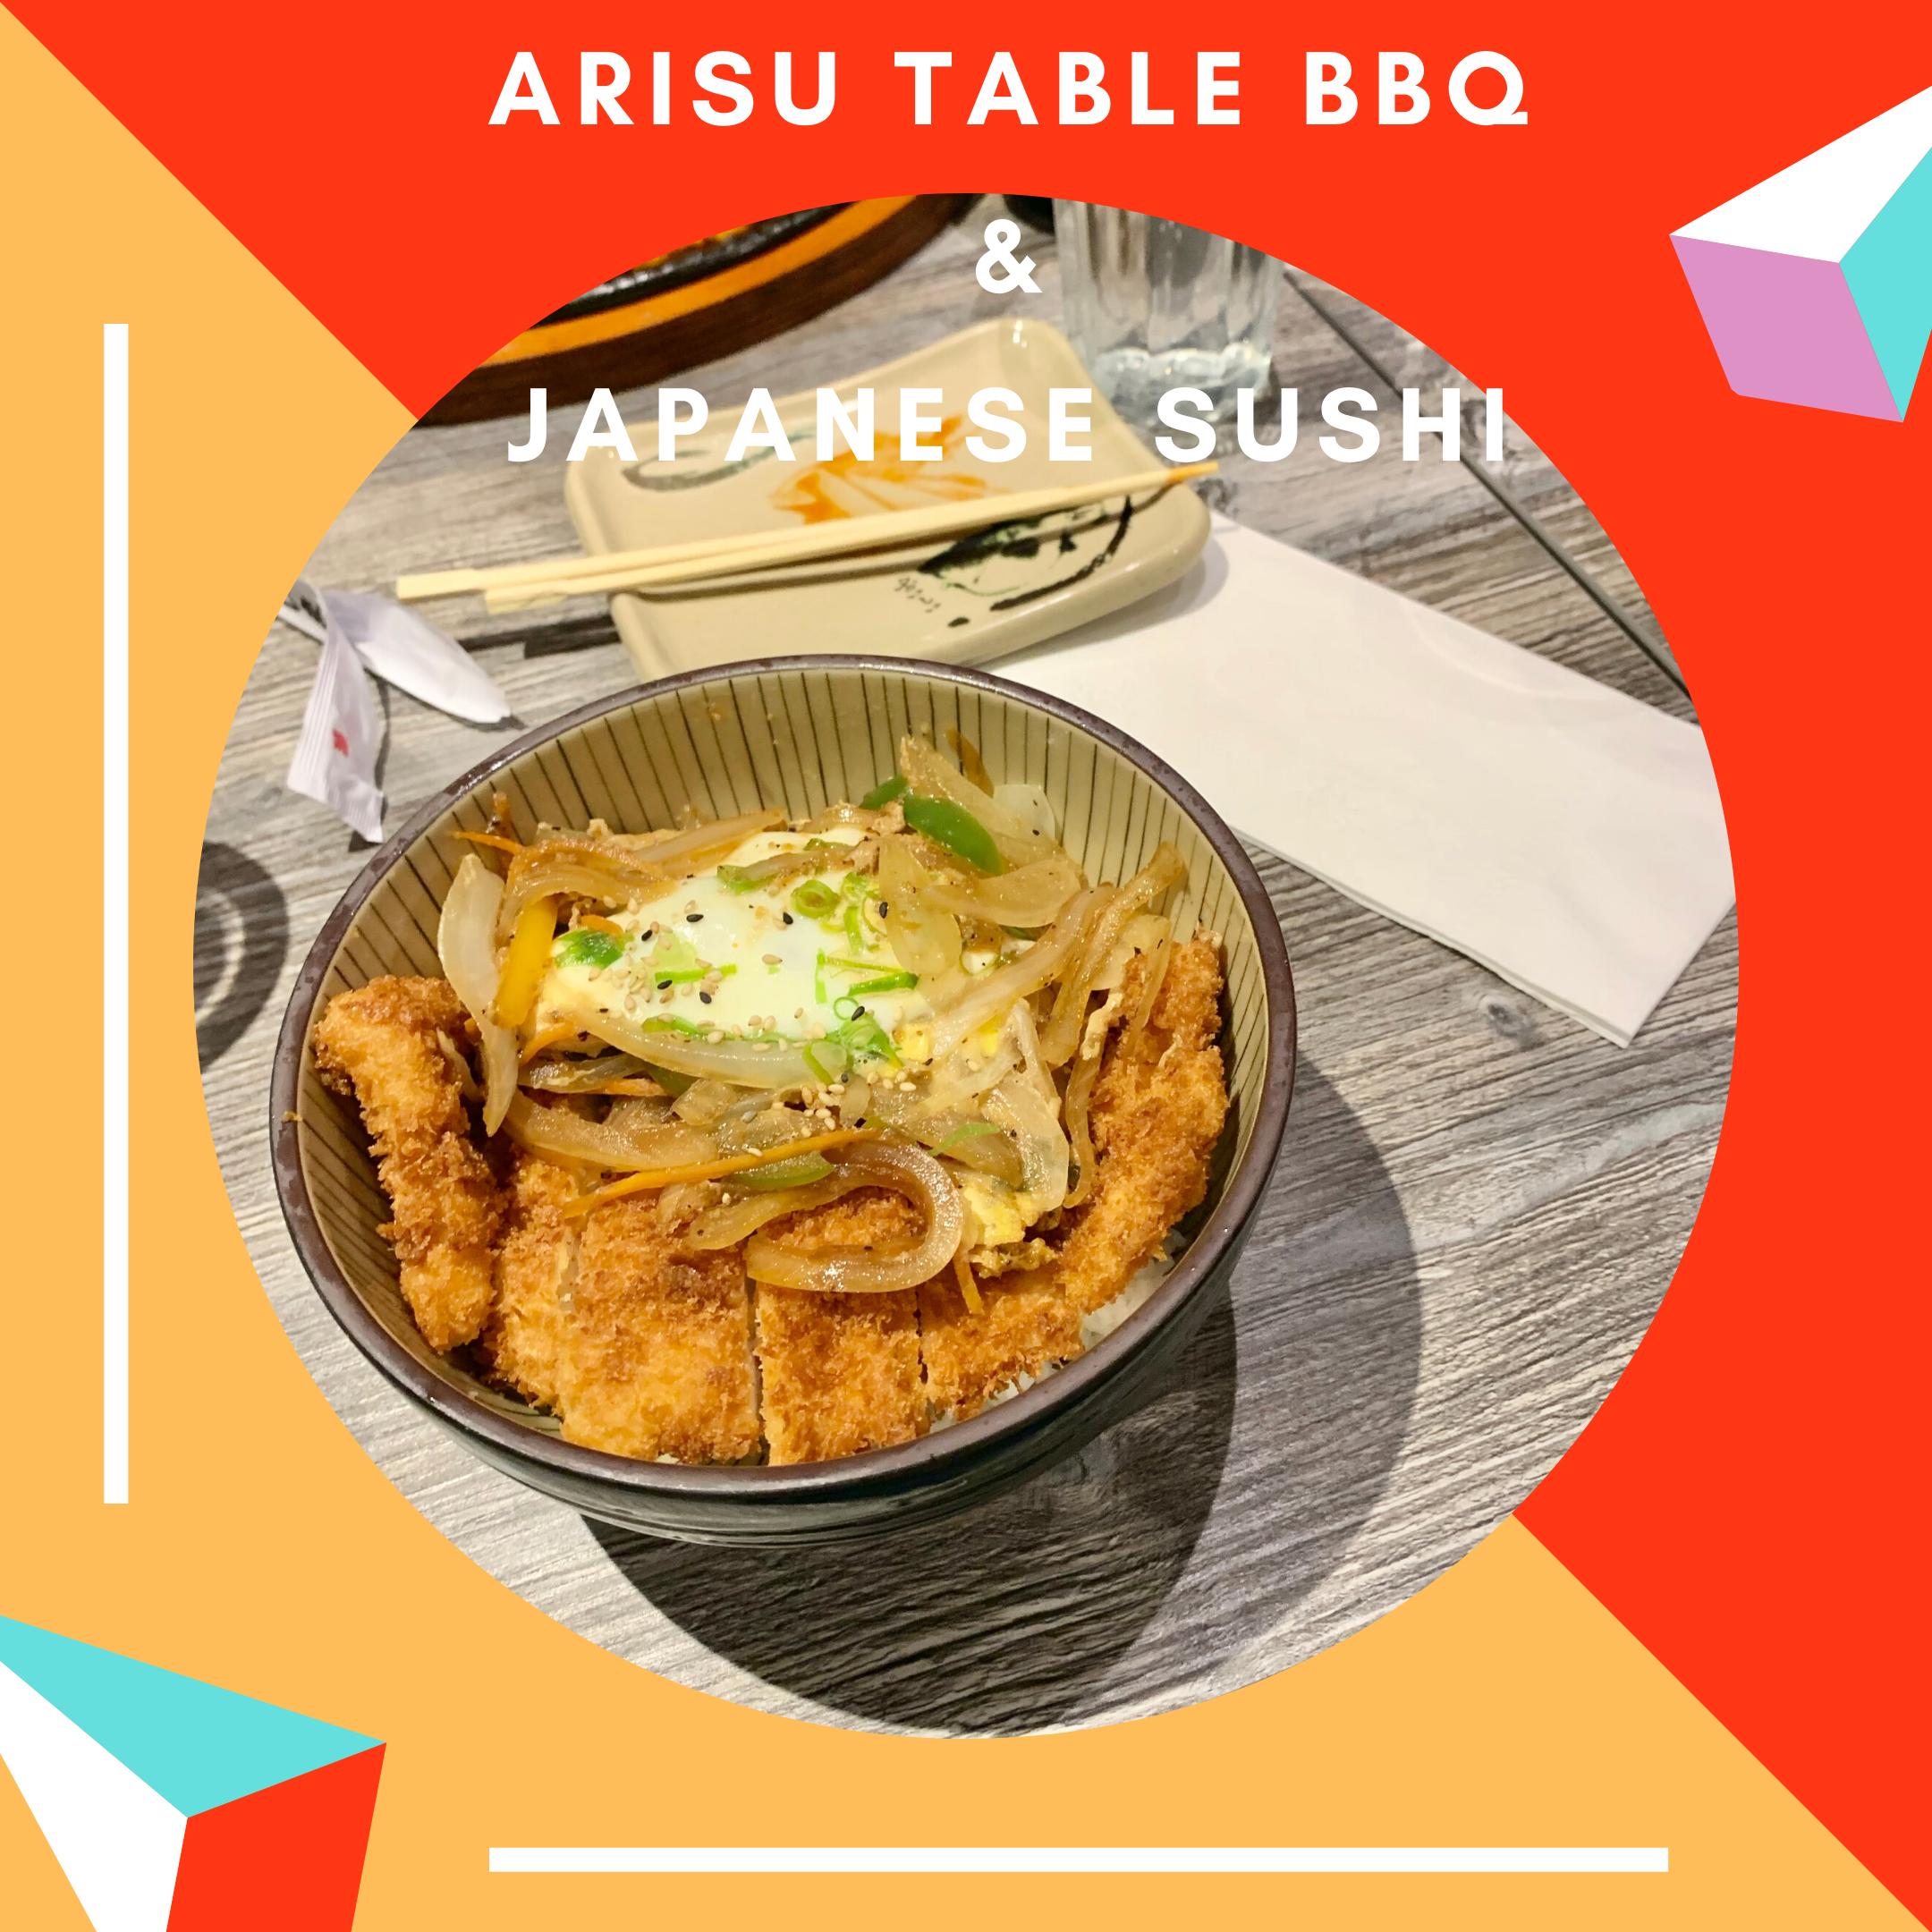 where-to-eat halifax -Arisu-Table-BBQ